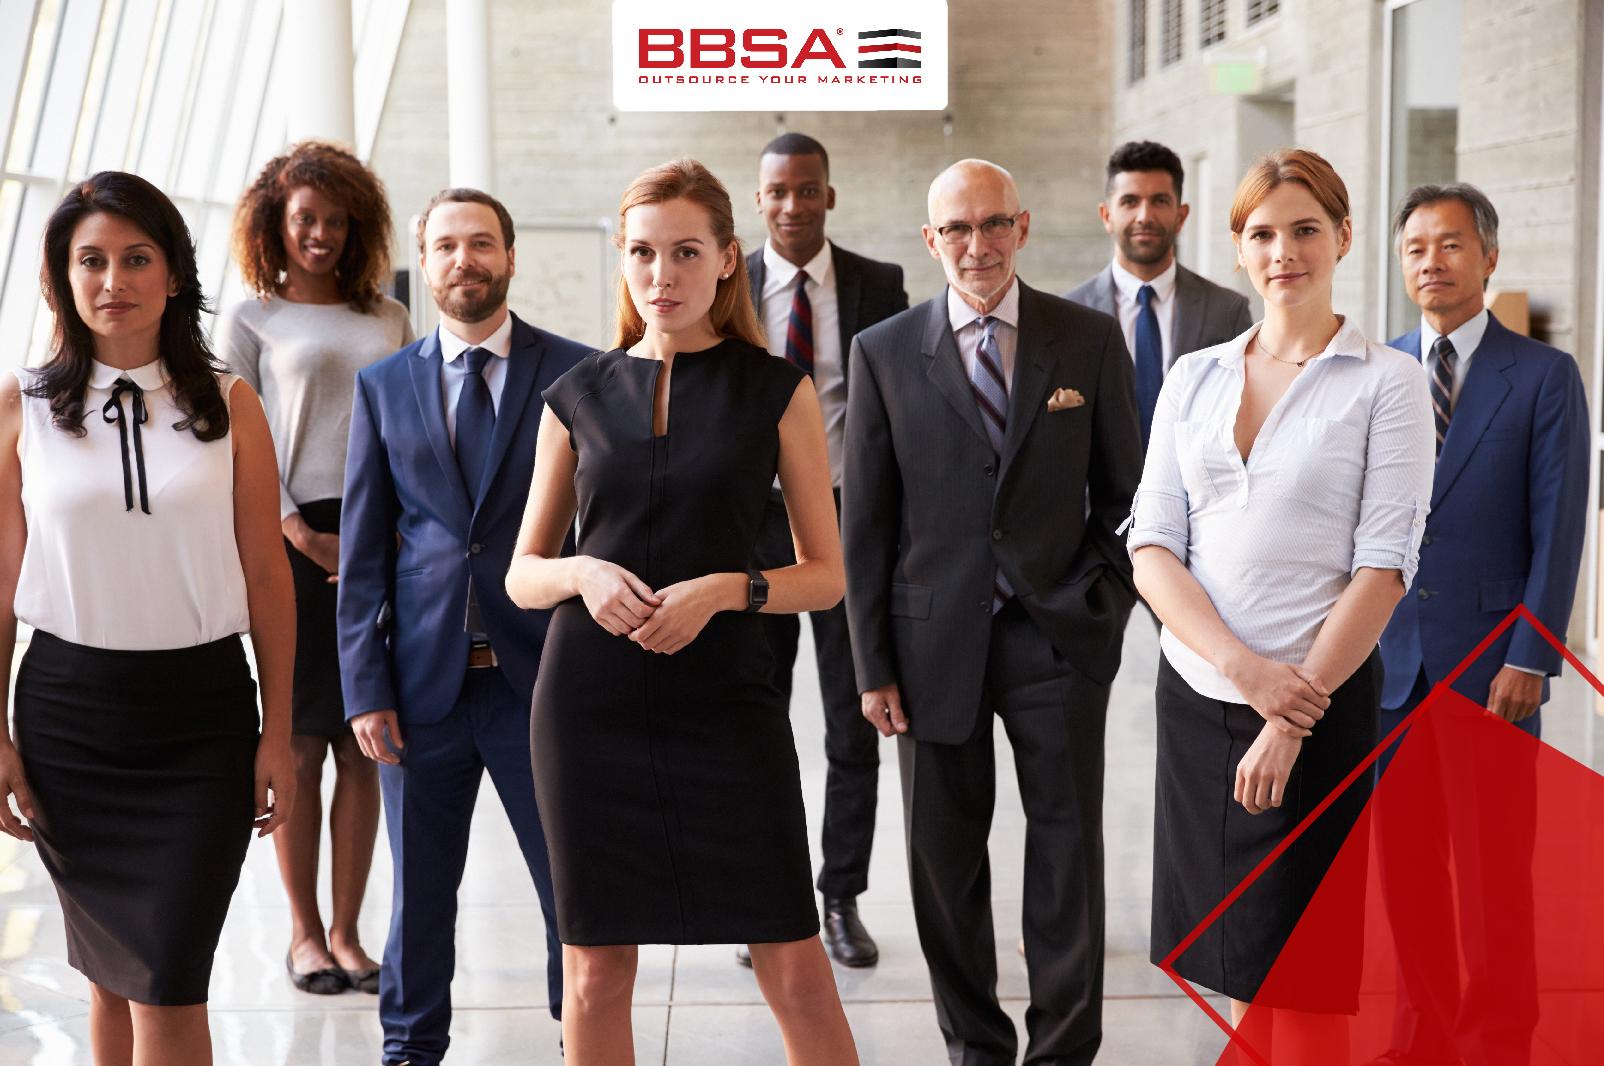 BBSA Marketing Strategy and Plan